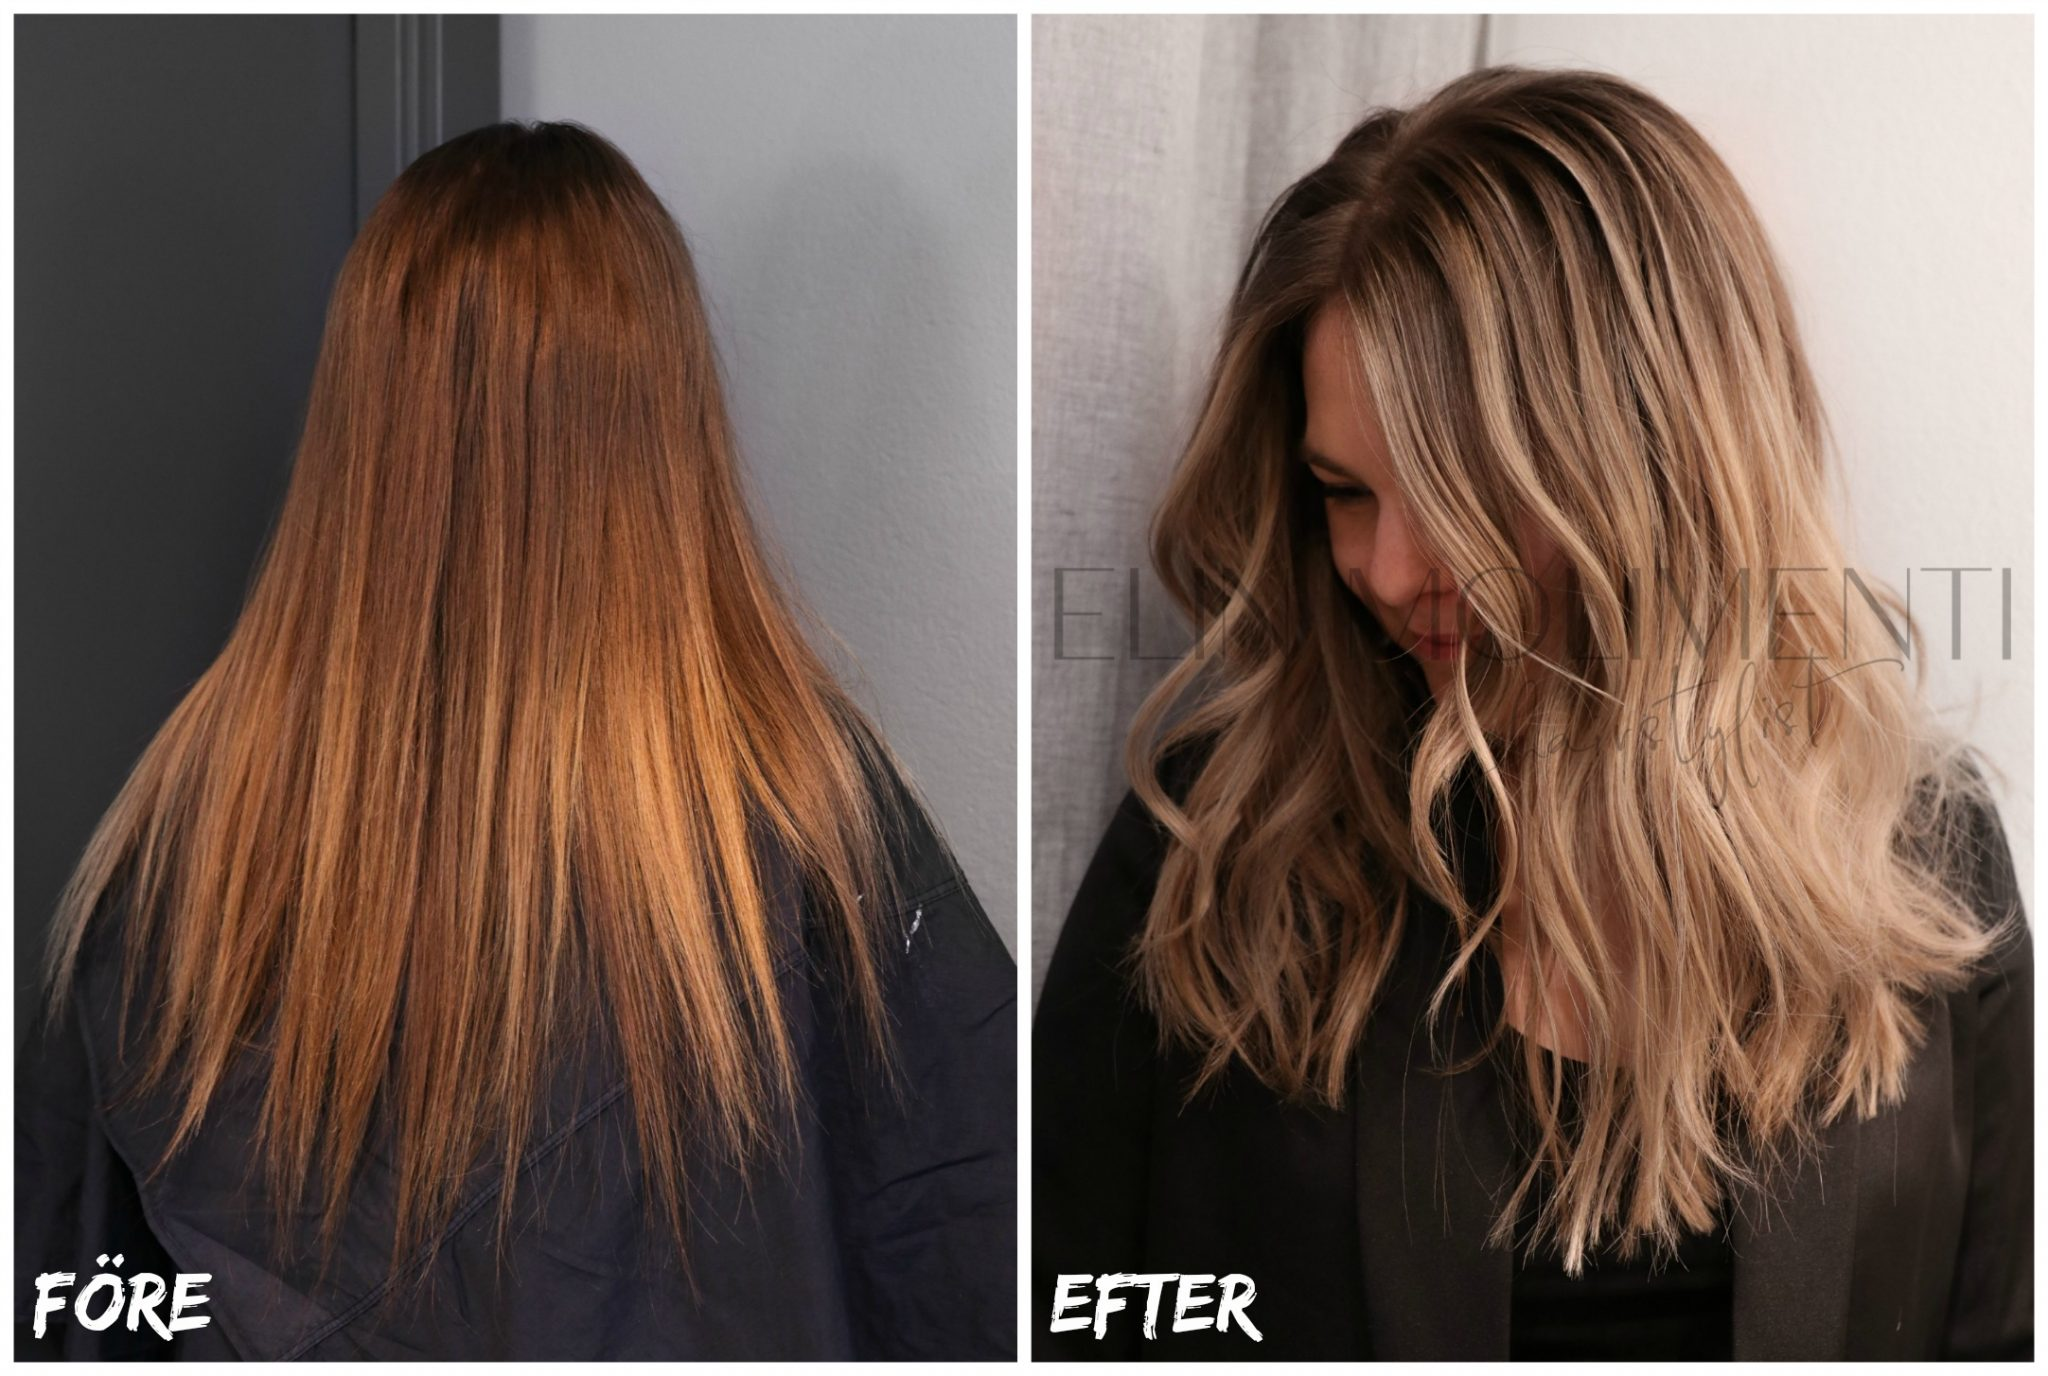 hur får man bort orange hår